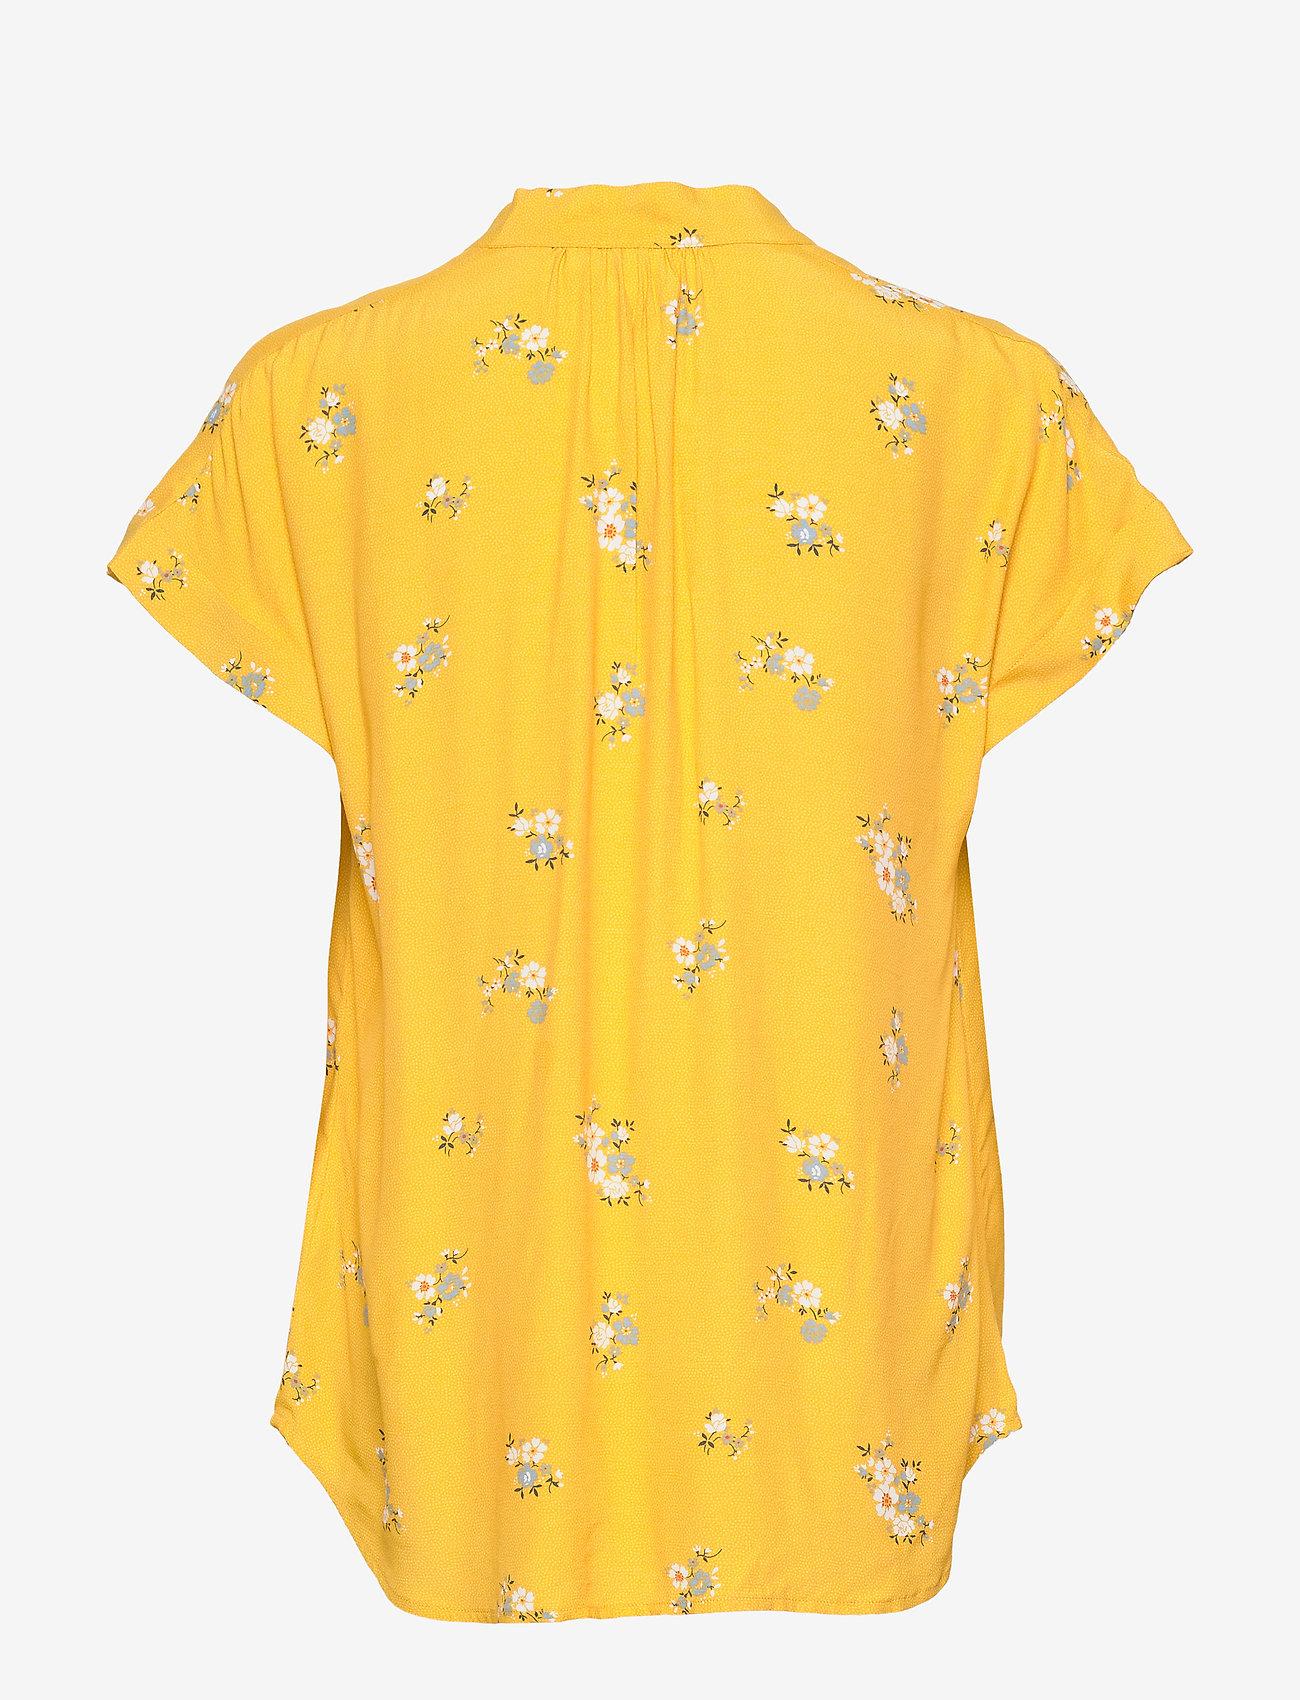 Short Sleeve Popover Top (Mini Yellow Floral) - GAP hCegTu